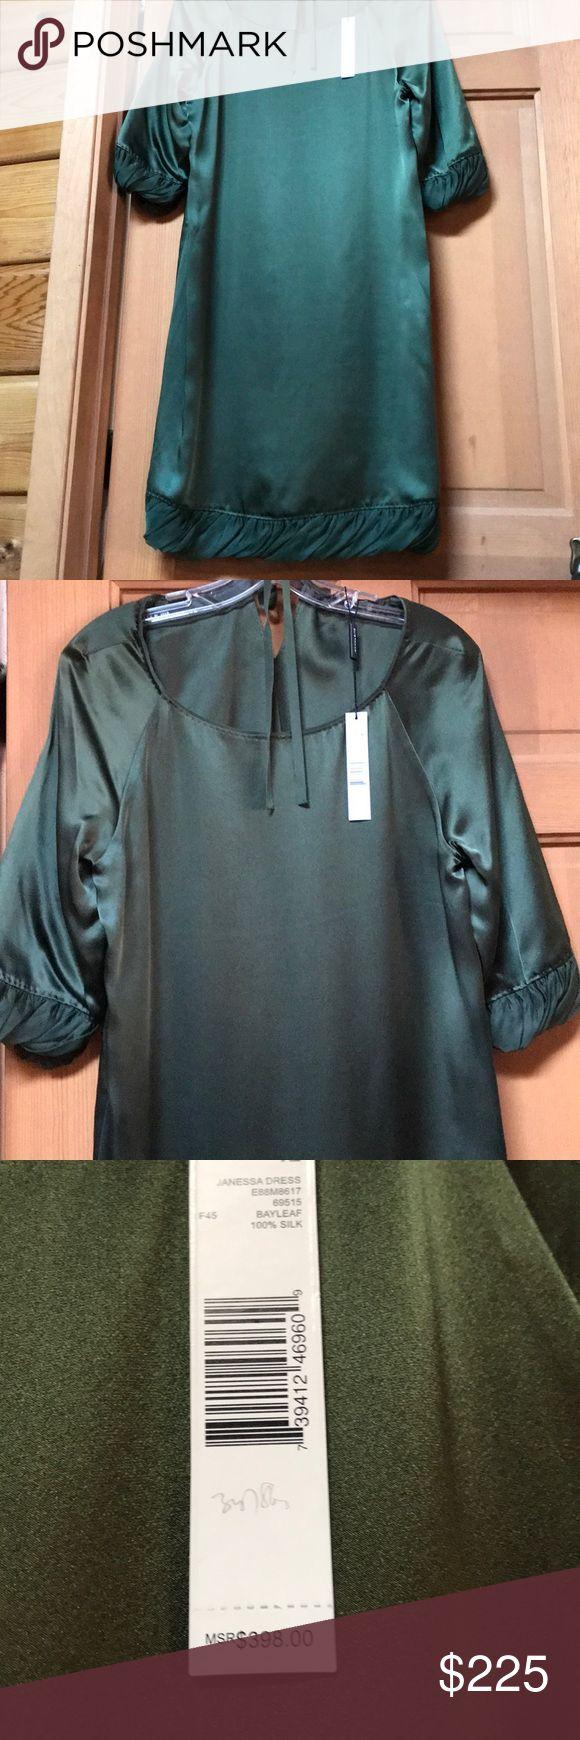 Elite Tahari green dress 100% silk. Size 12. Brand new avocado silk dress by Elie Tahari. Runs a bit small -scoop neck w/loose belt if desired. Elie Tahari Dresses Long Sleeve